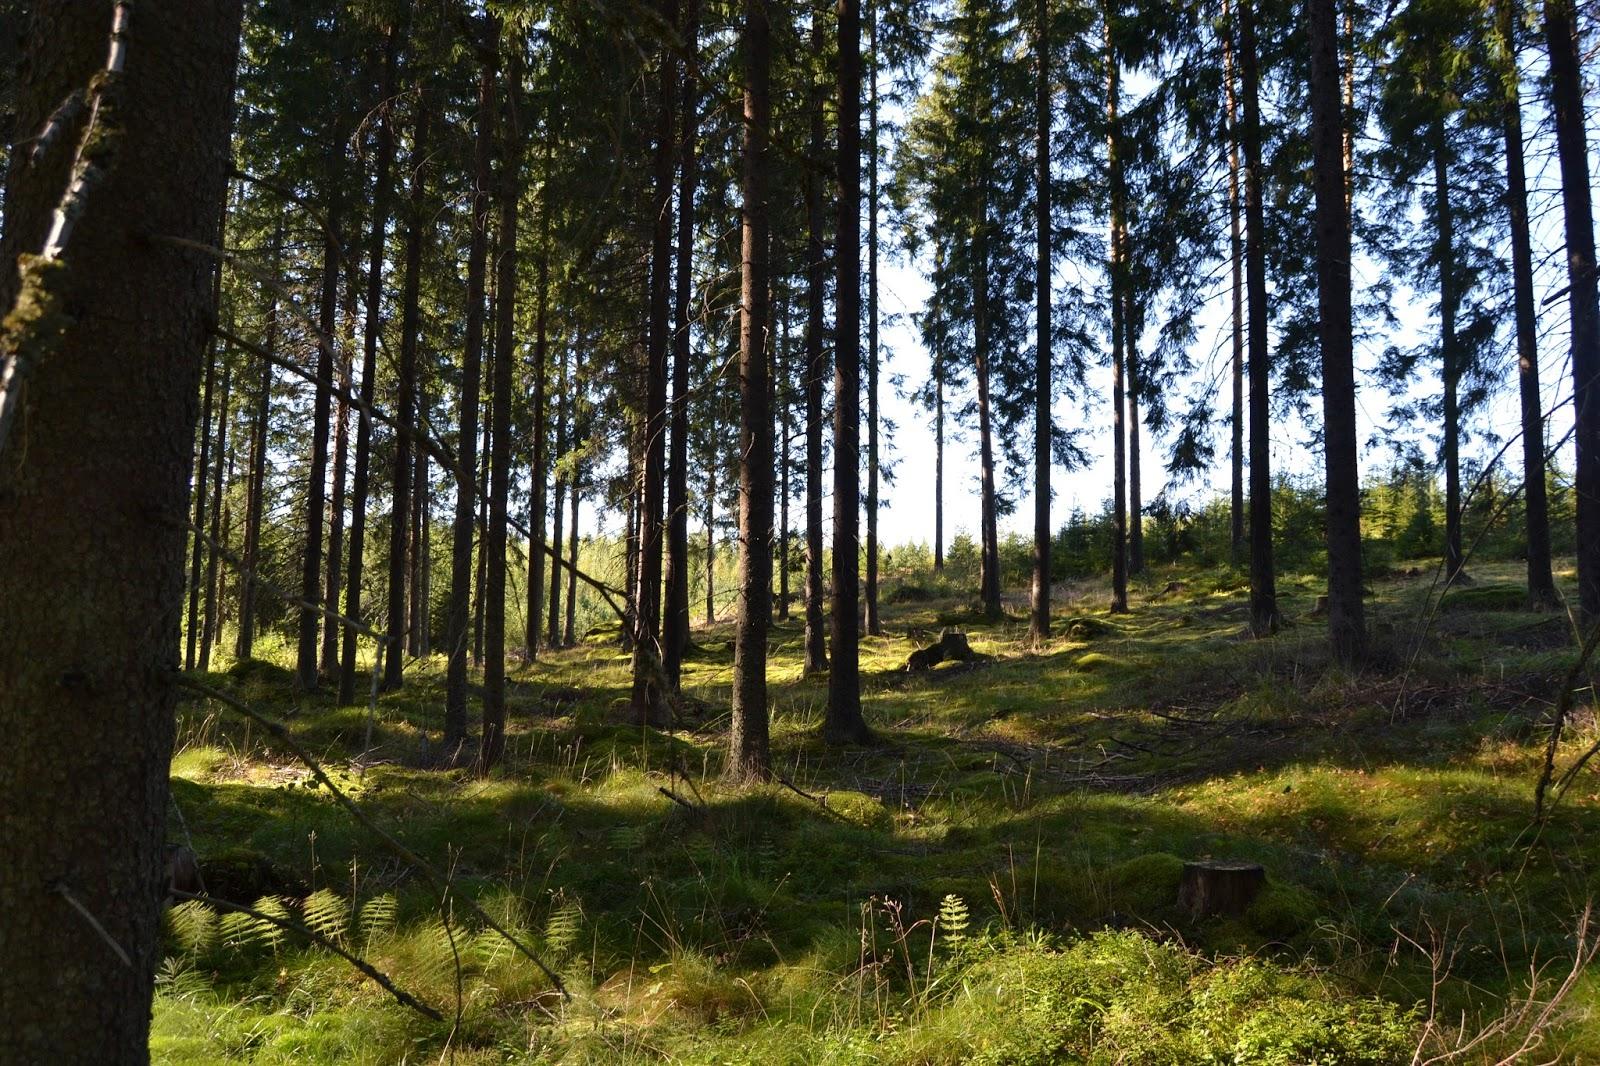 Jos metsään haluat mennä nyt… – Picking mushrooms..